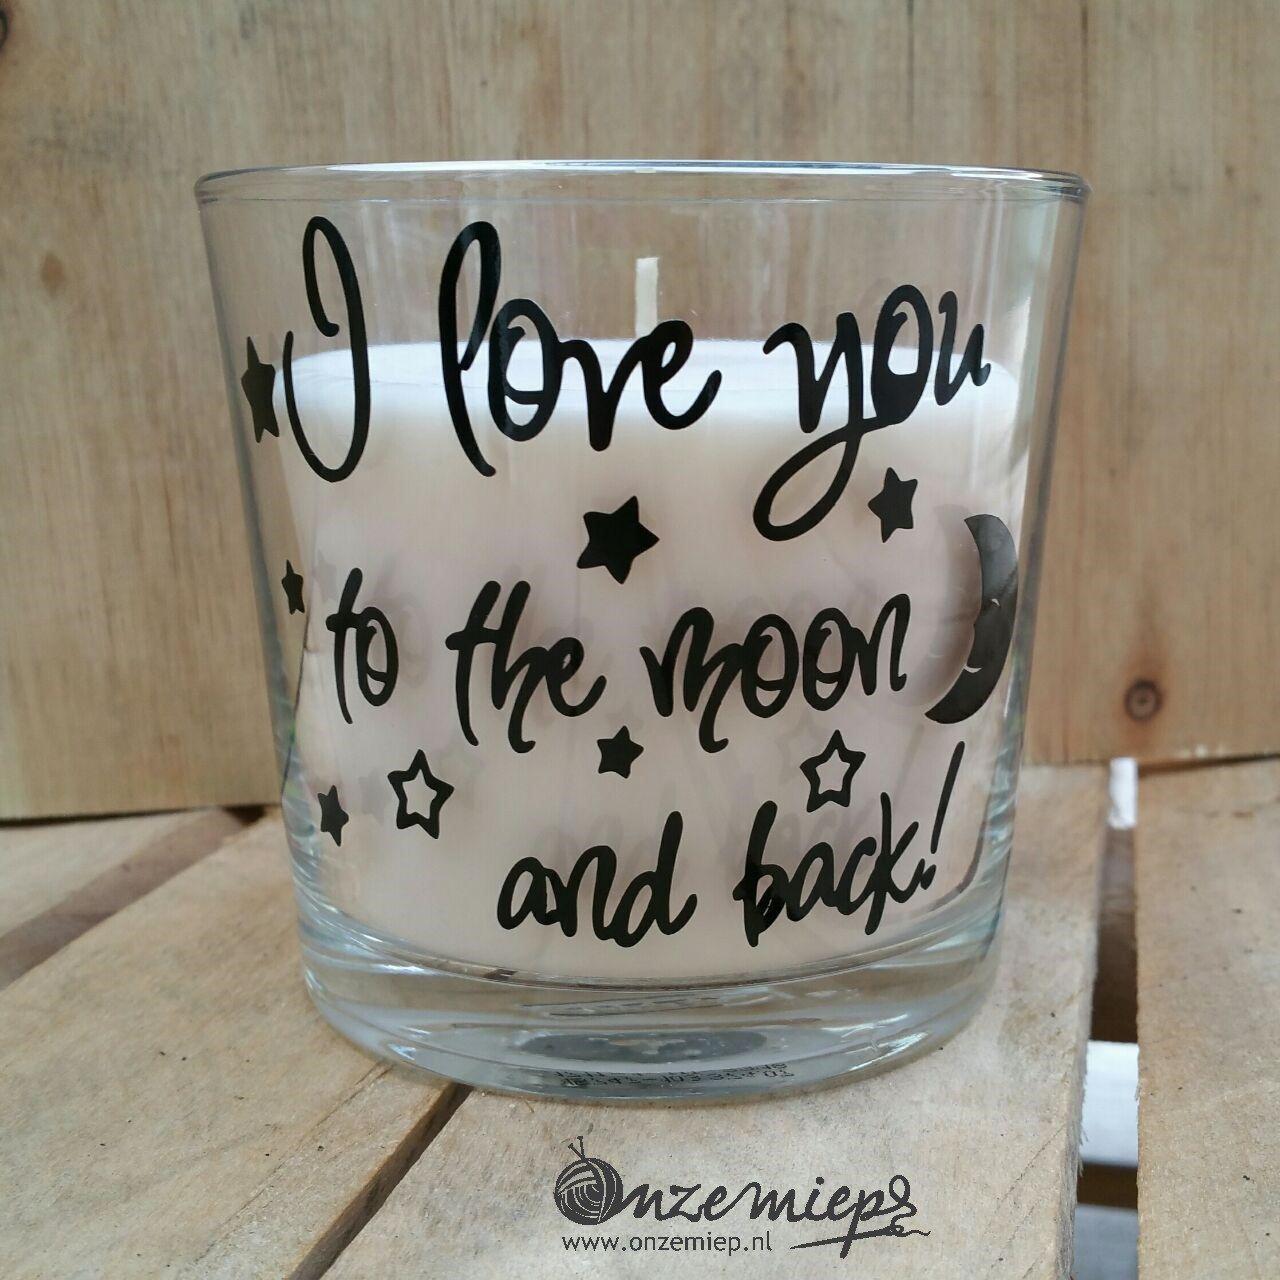 "Witte geurkaars met de tekst ""I love you to the moon and back"""